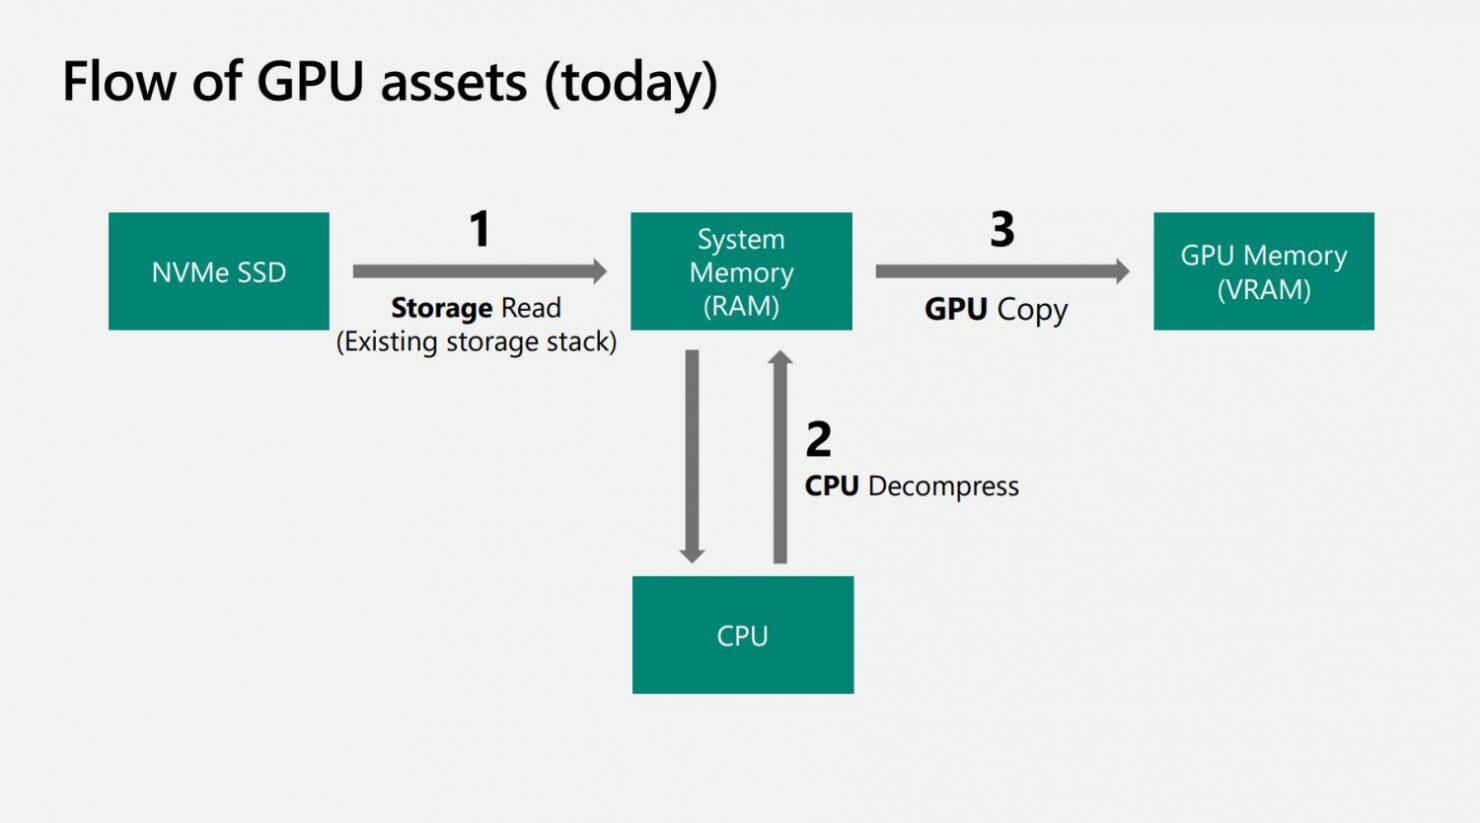 78869_43_directstorage-uses-new-algorithm-to-unlock-max-io-with-desktop-gpus_full